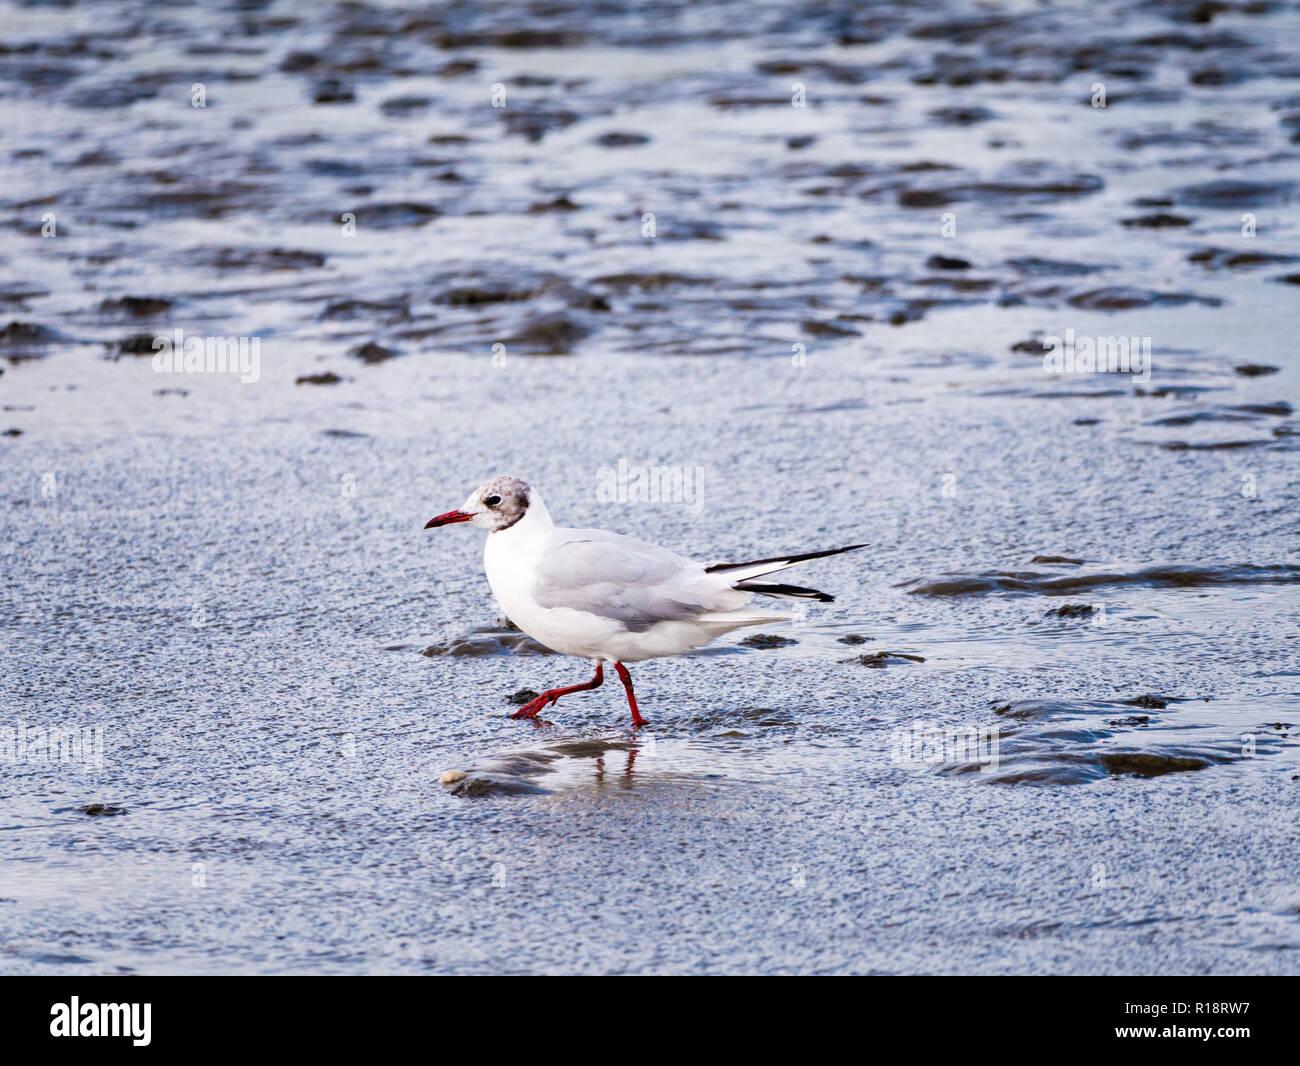 Adult black-headed gull, Chroicocephalus ridibundus, in non-breeding plumage wading in shallow water, Netherlands Stock Photo